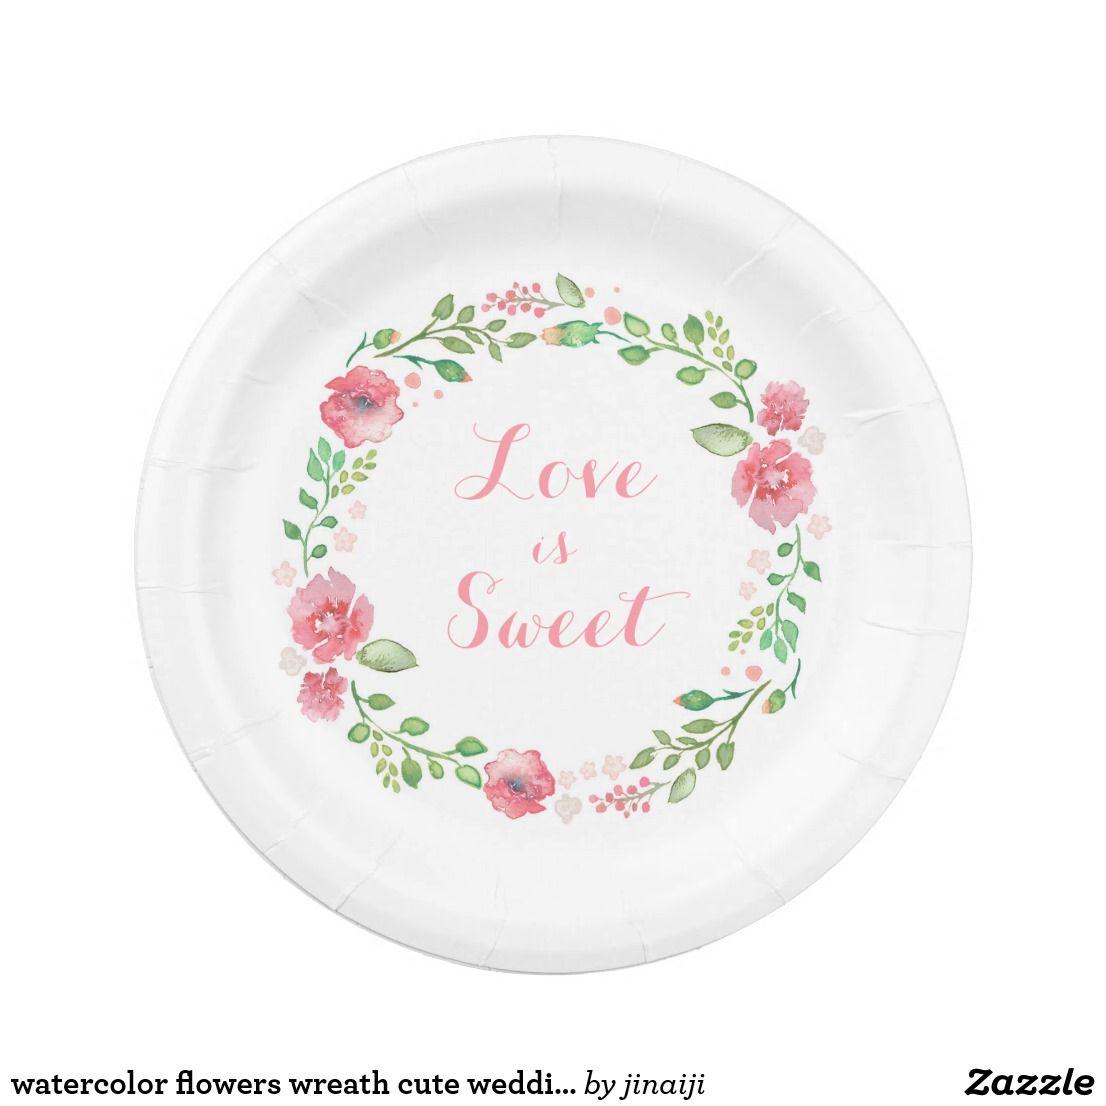 watercolor flowers wreath cute wedding paper plate  sc 1 st  Pinterest & watercolor flowers wreath cute wedding paper plate | Wedding and ...